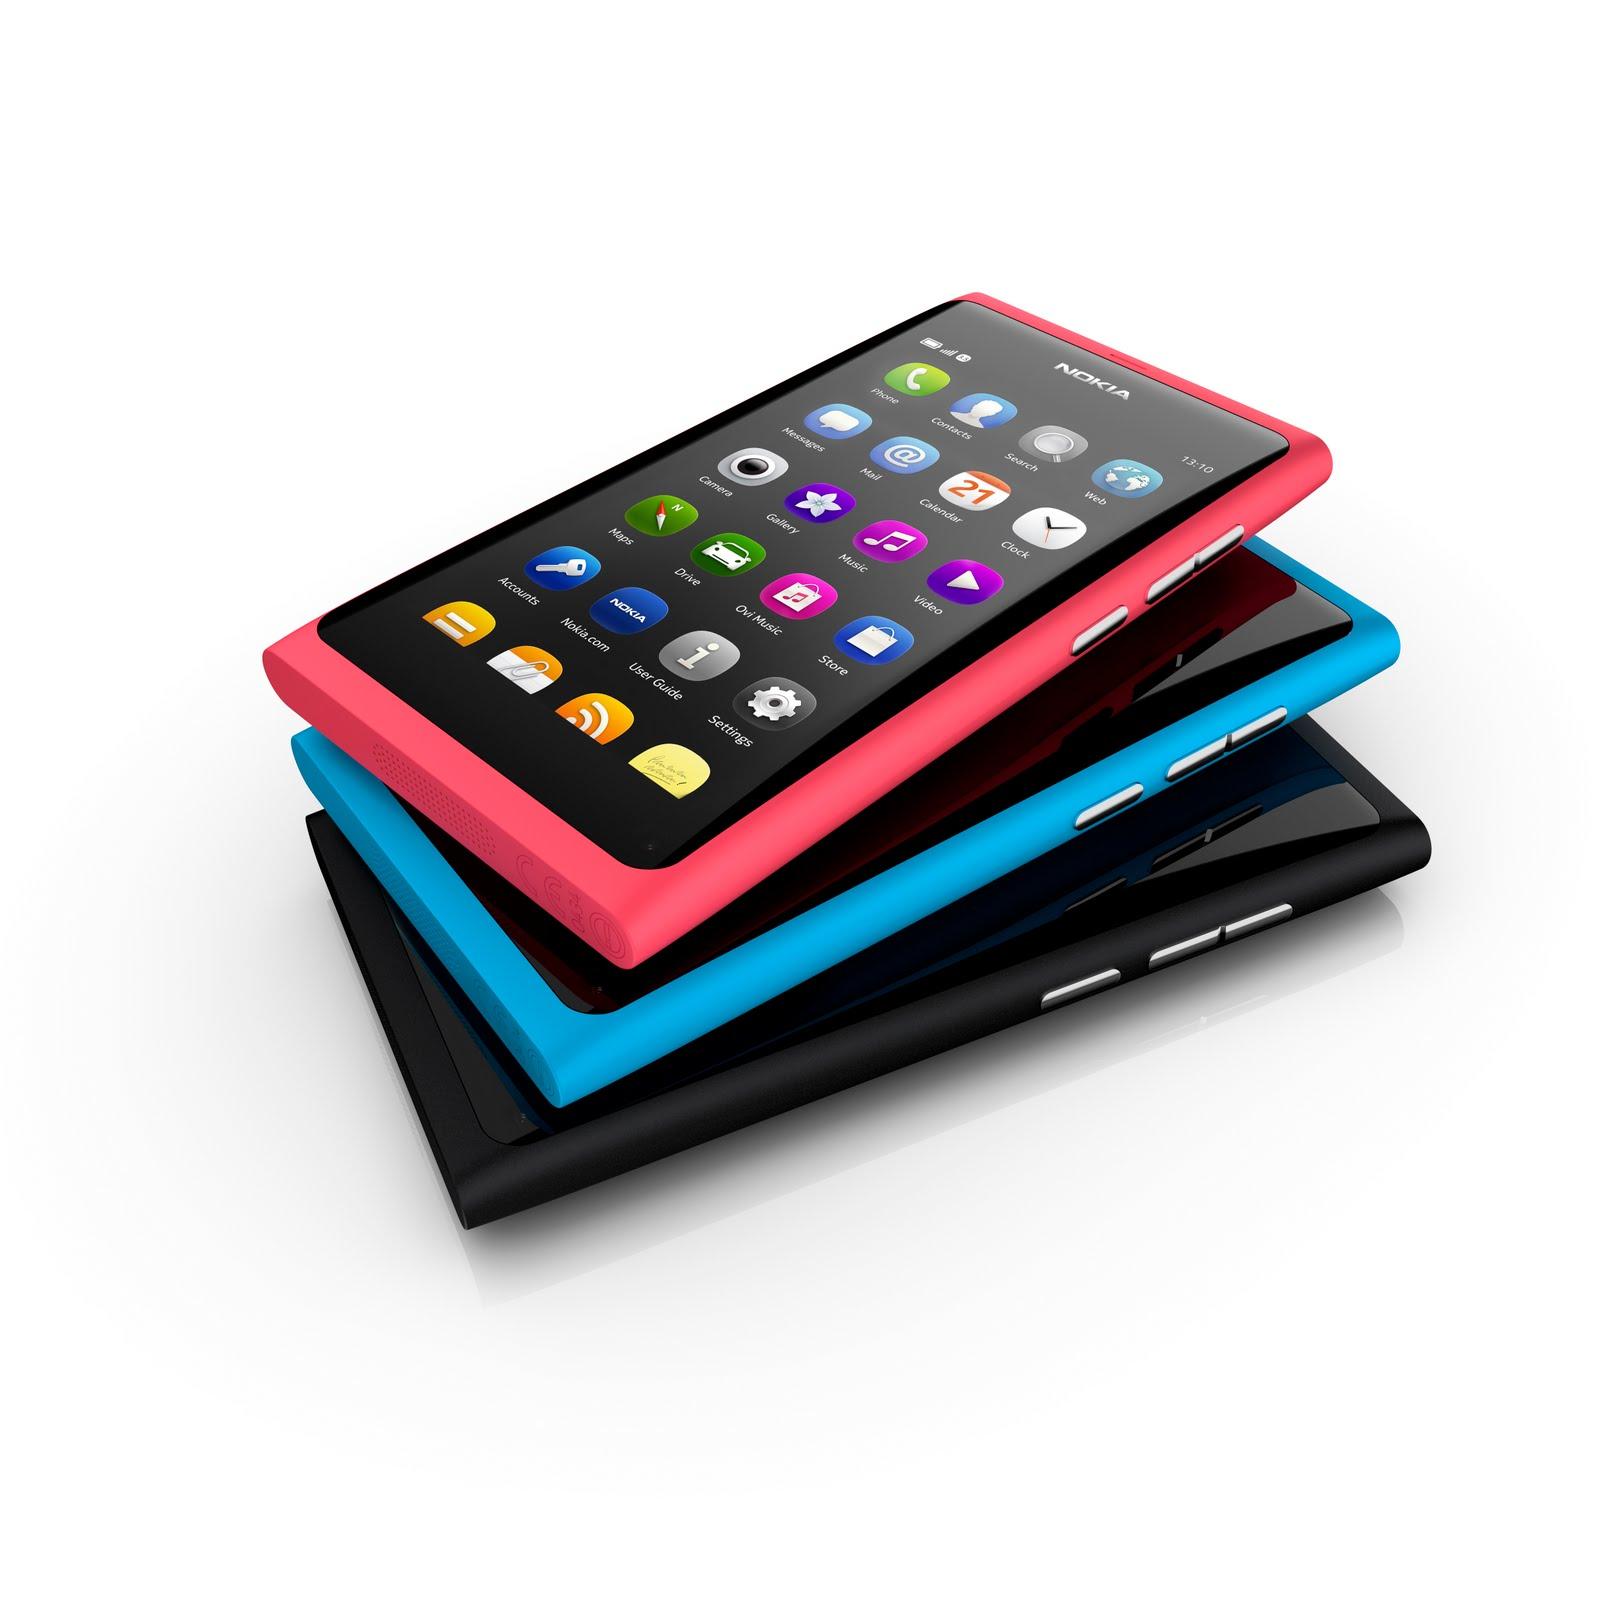 The Nokia N9 | Adamok.Net